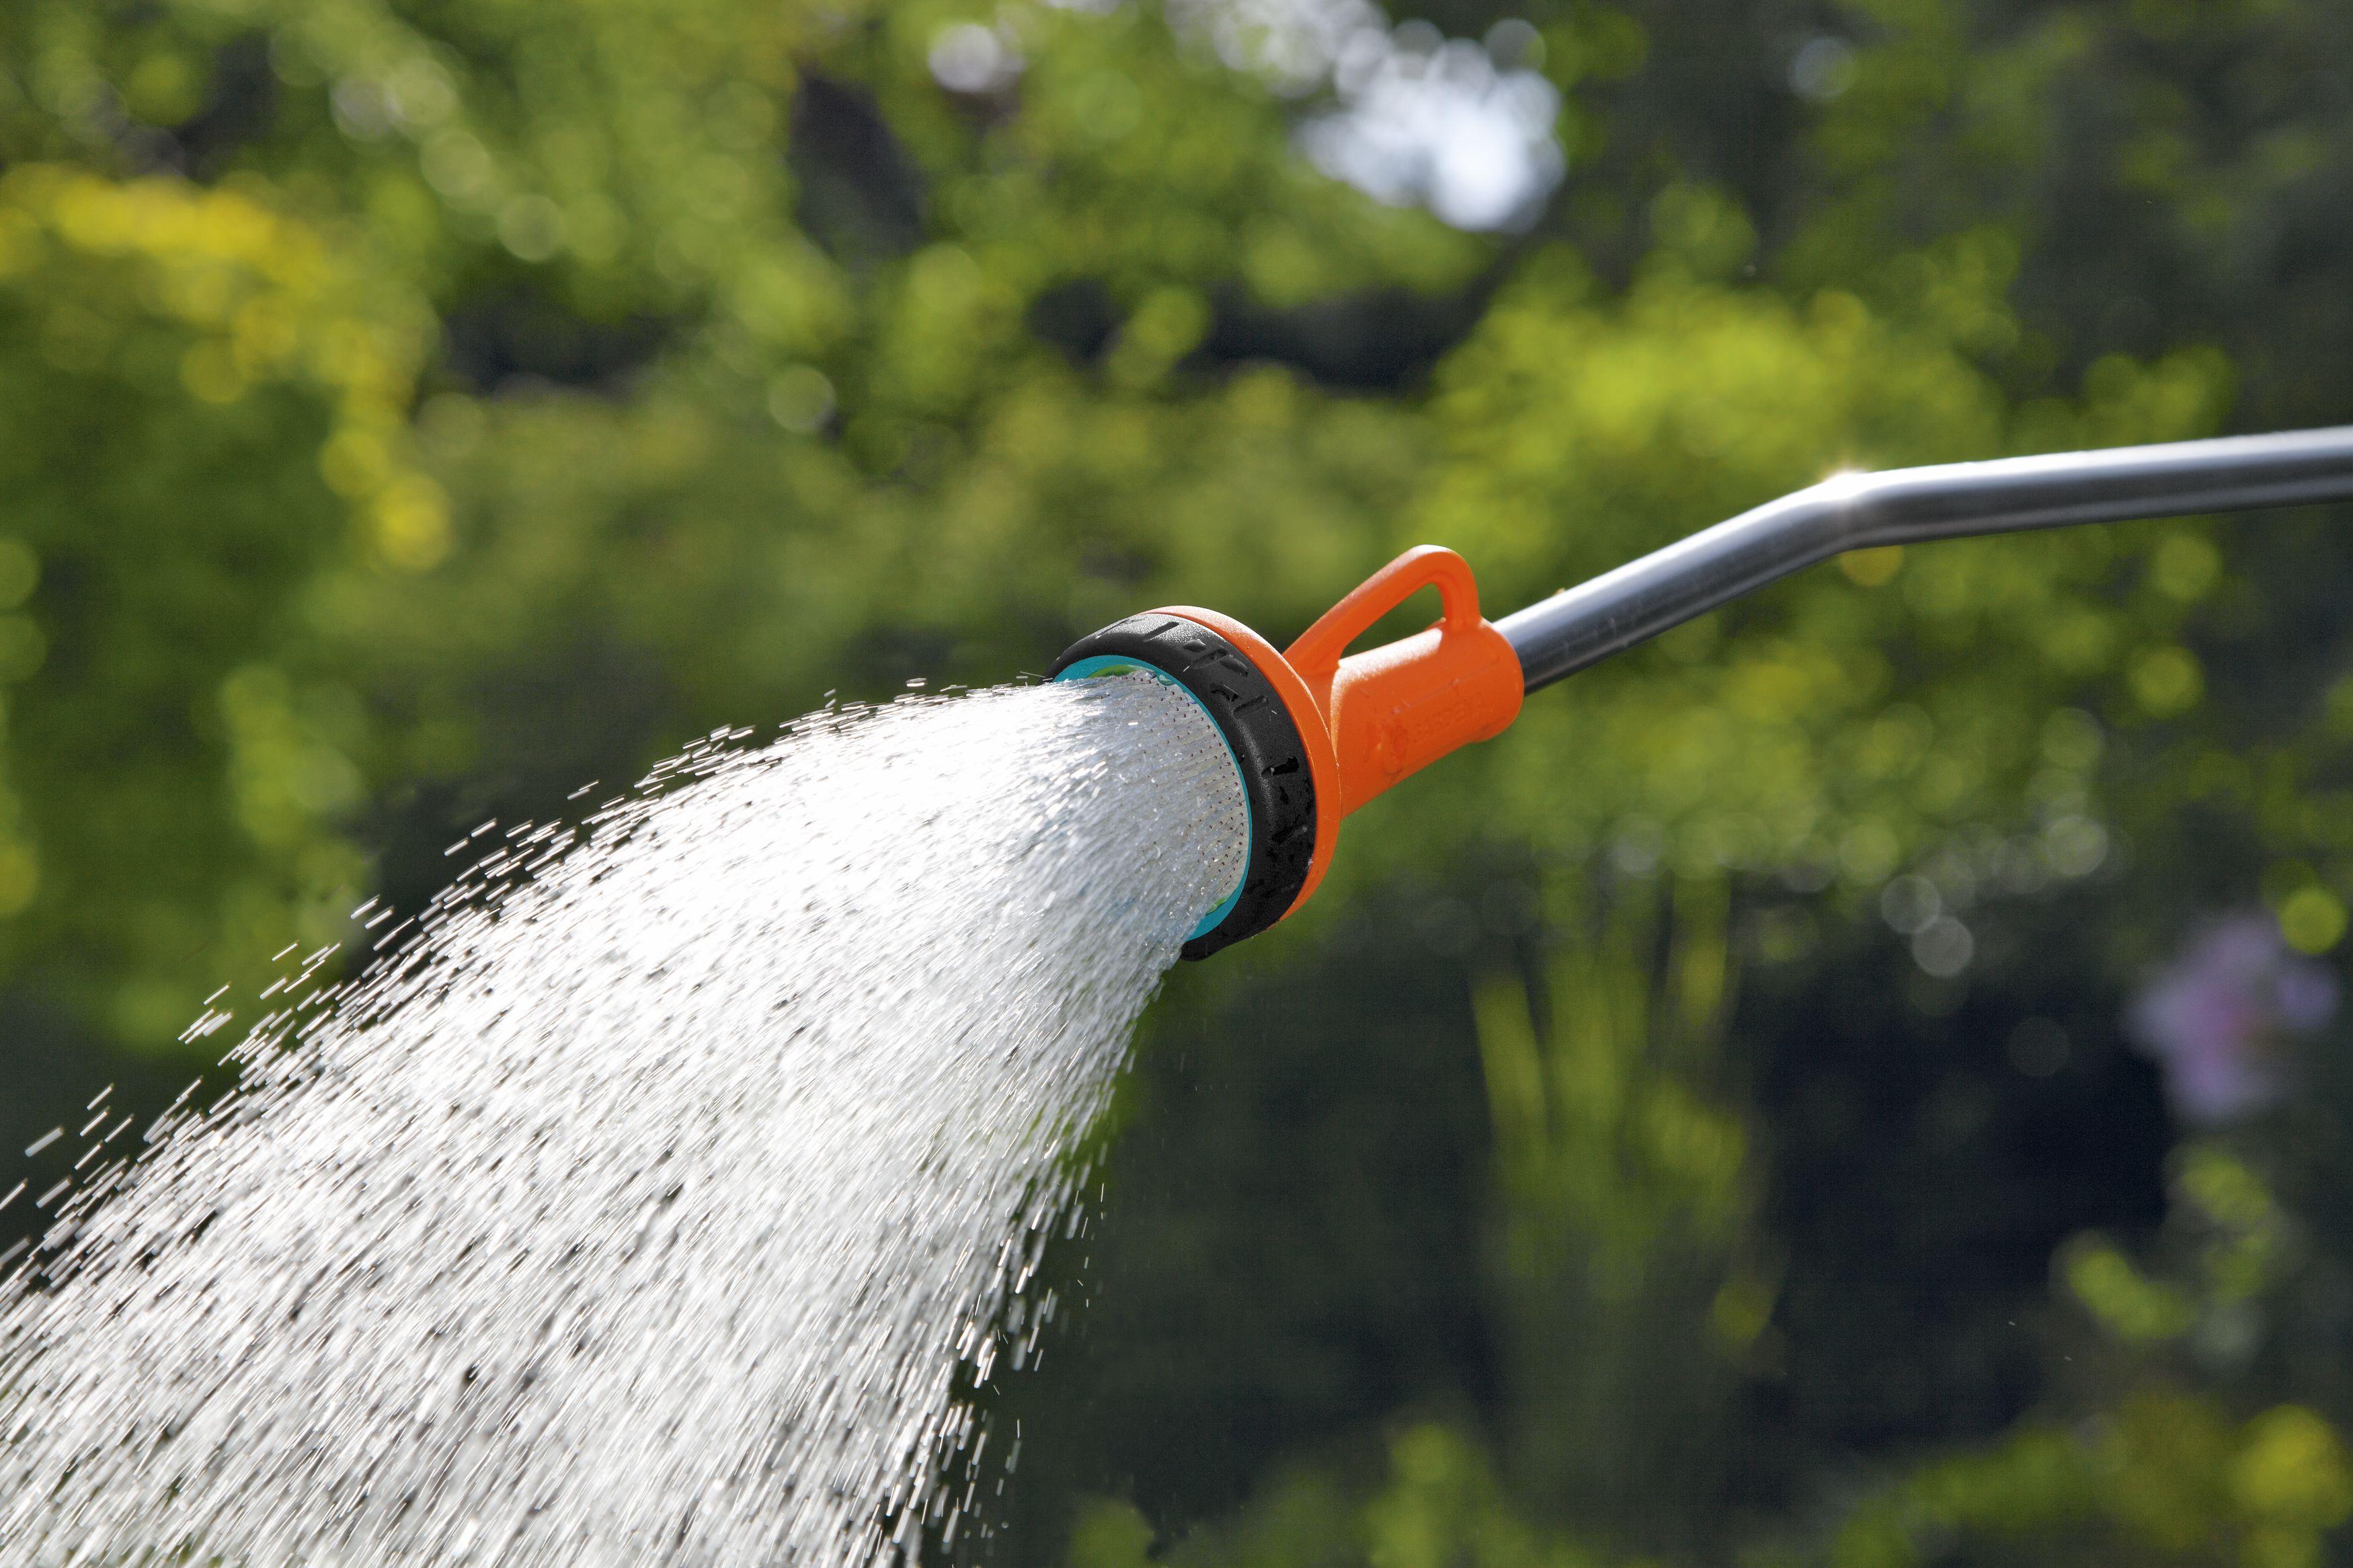 Gardena Spray Lance G18330 32